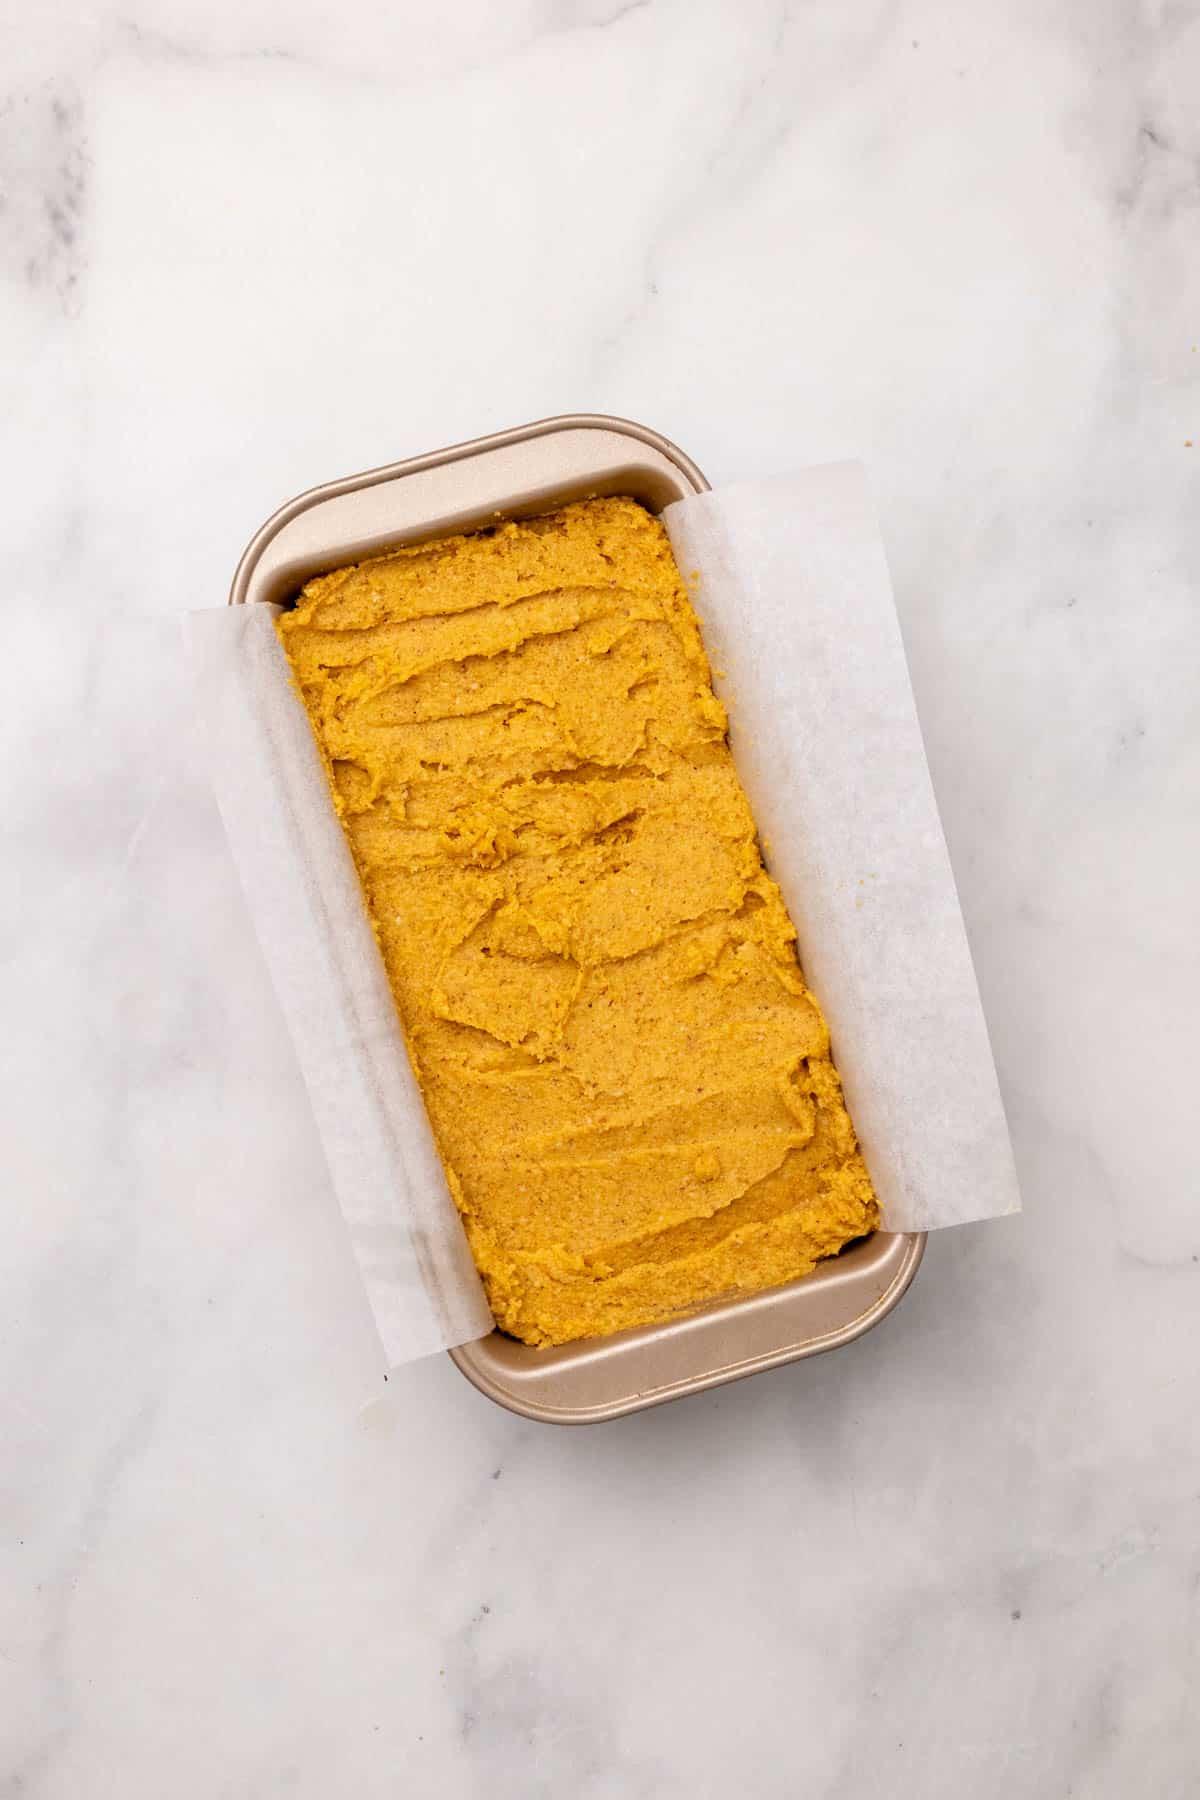 Unbaked pumpkin bread batter in the loaf pan